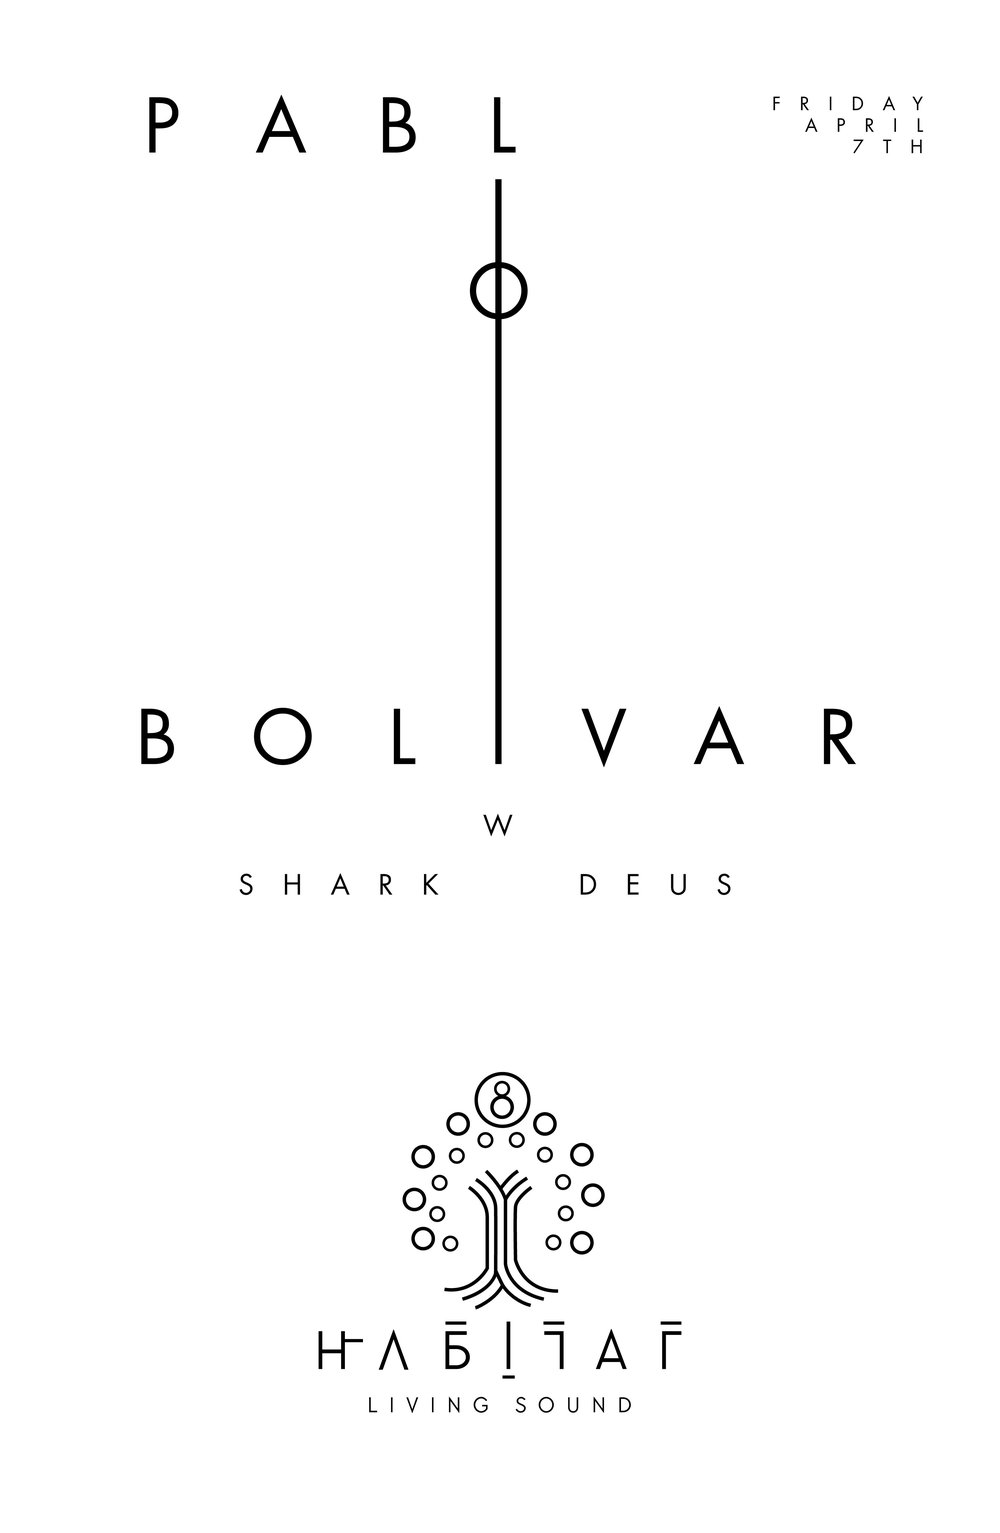 pablo-bolivar-habitat-living-sound.jpeg